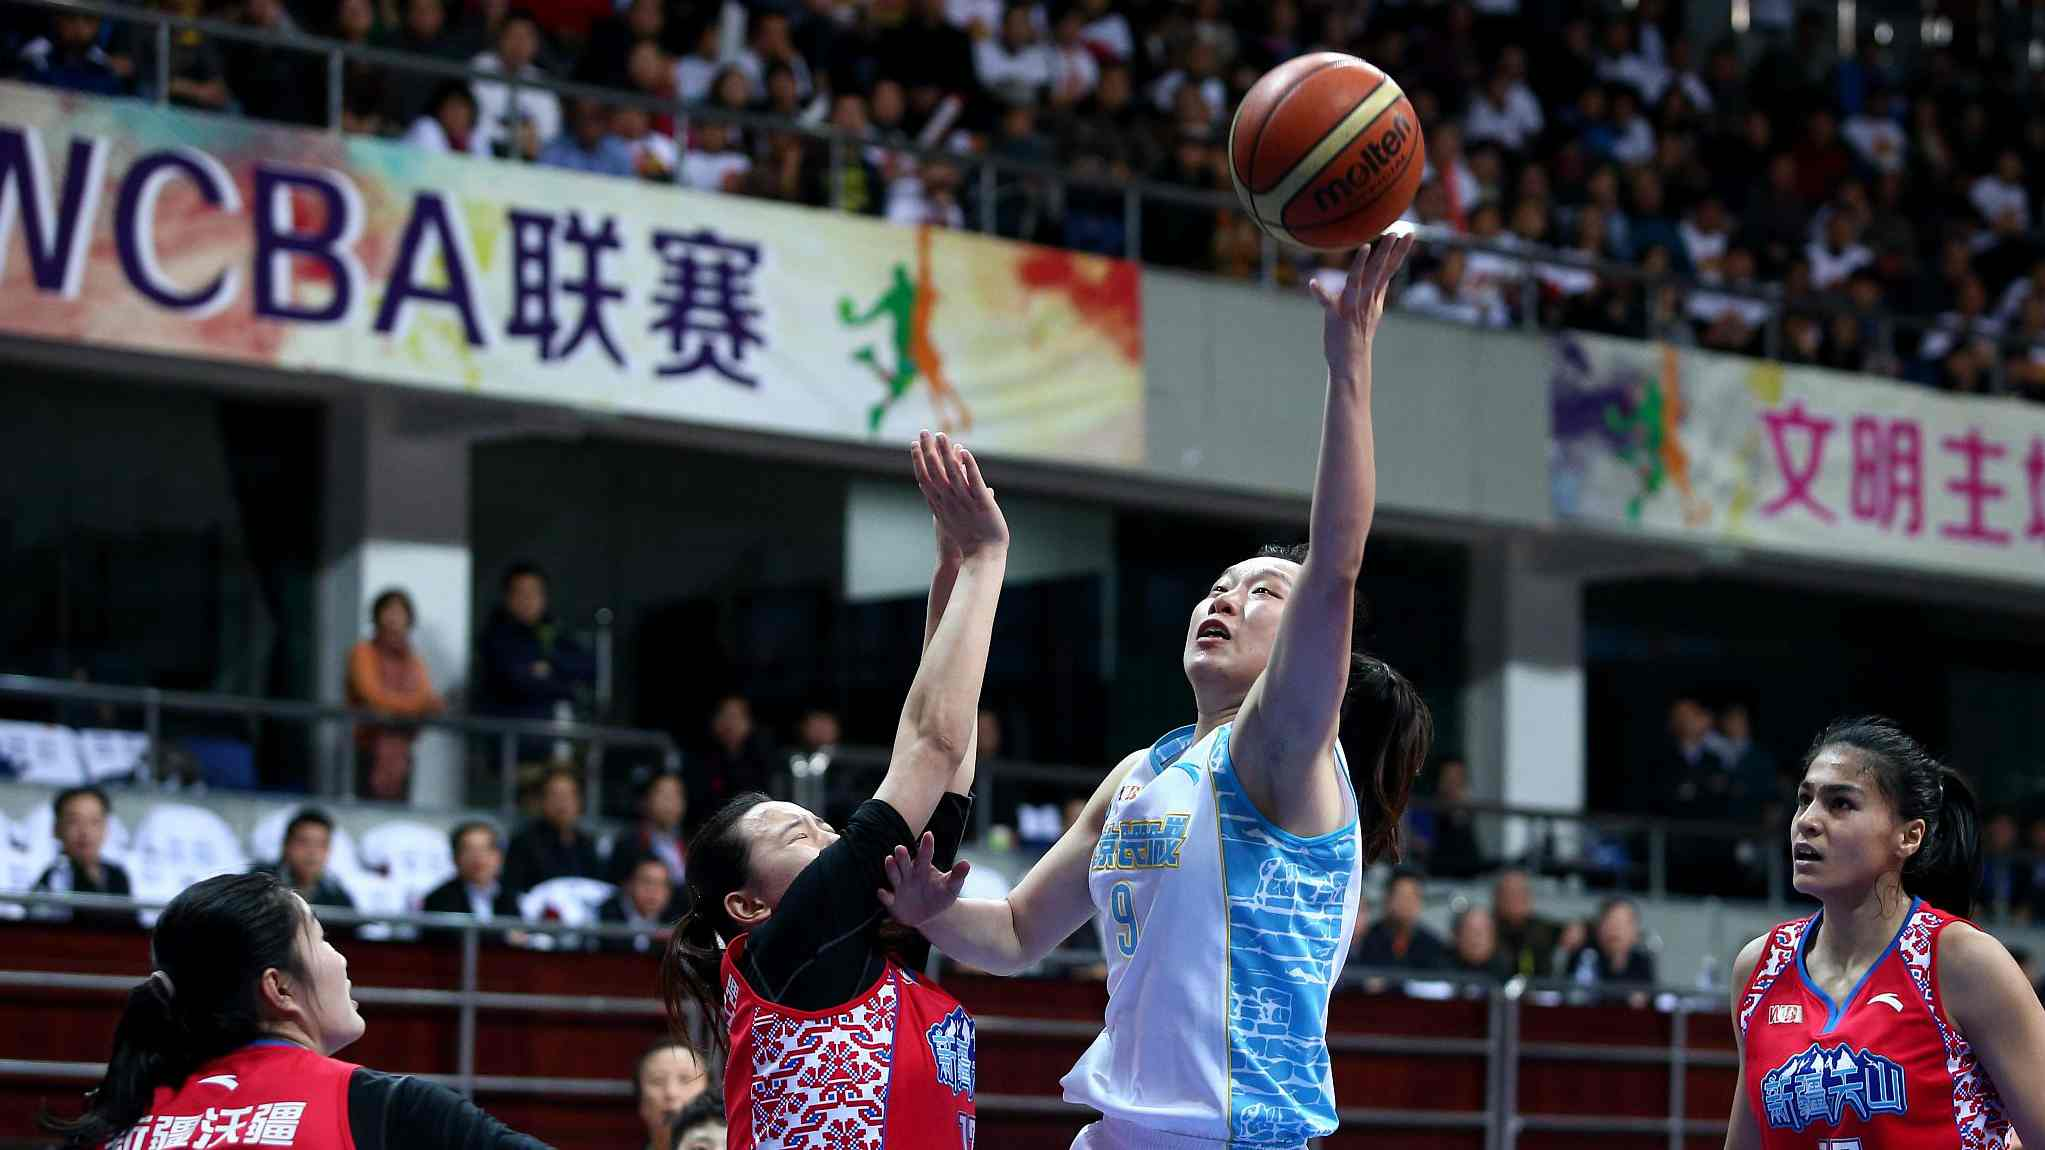 China's WCBA league postponed amid epidemic concern